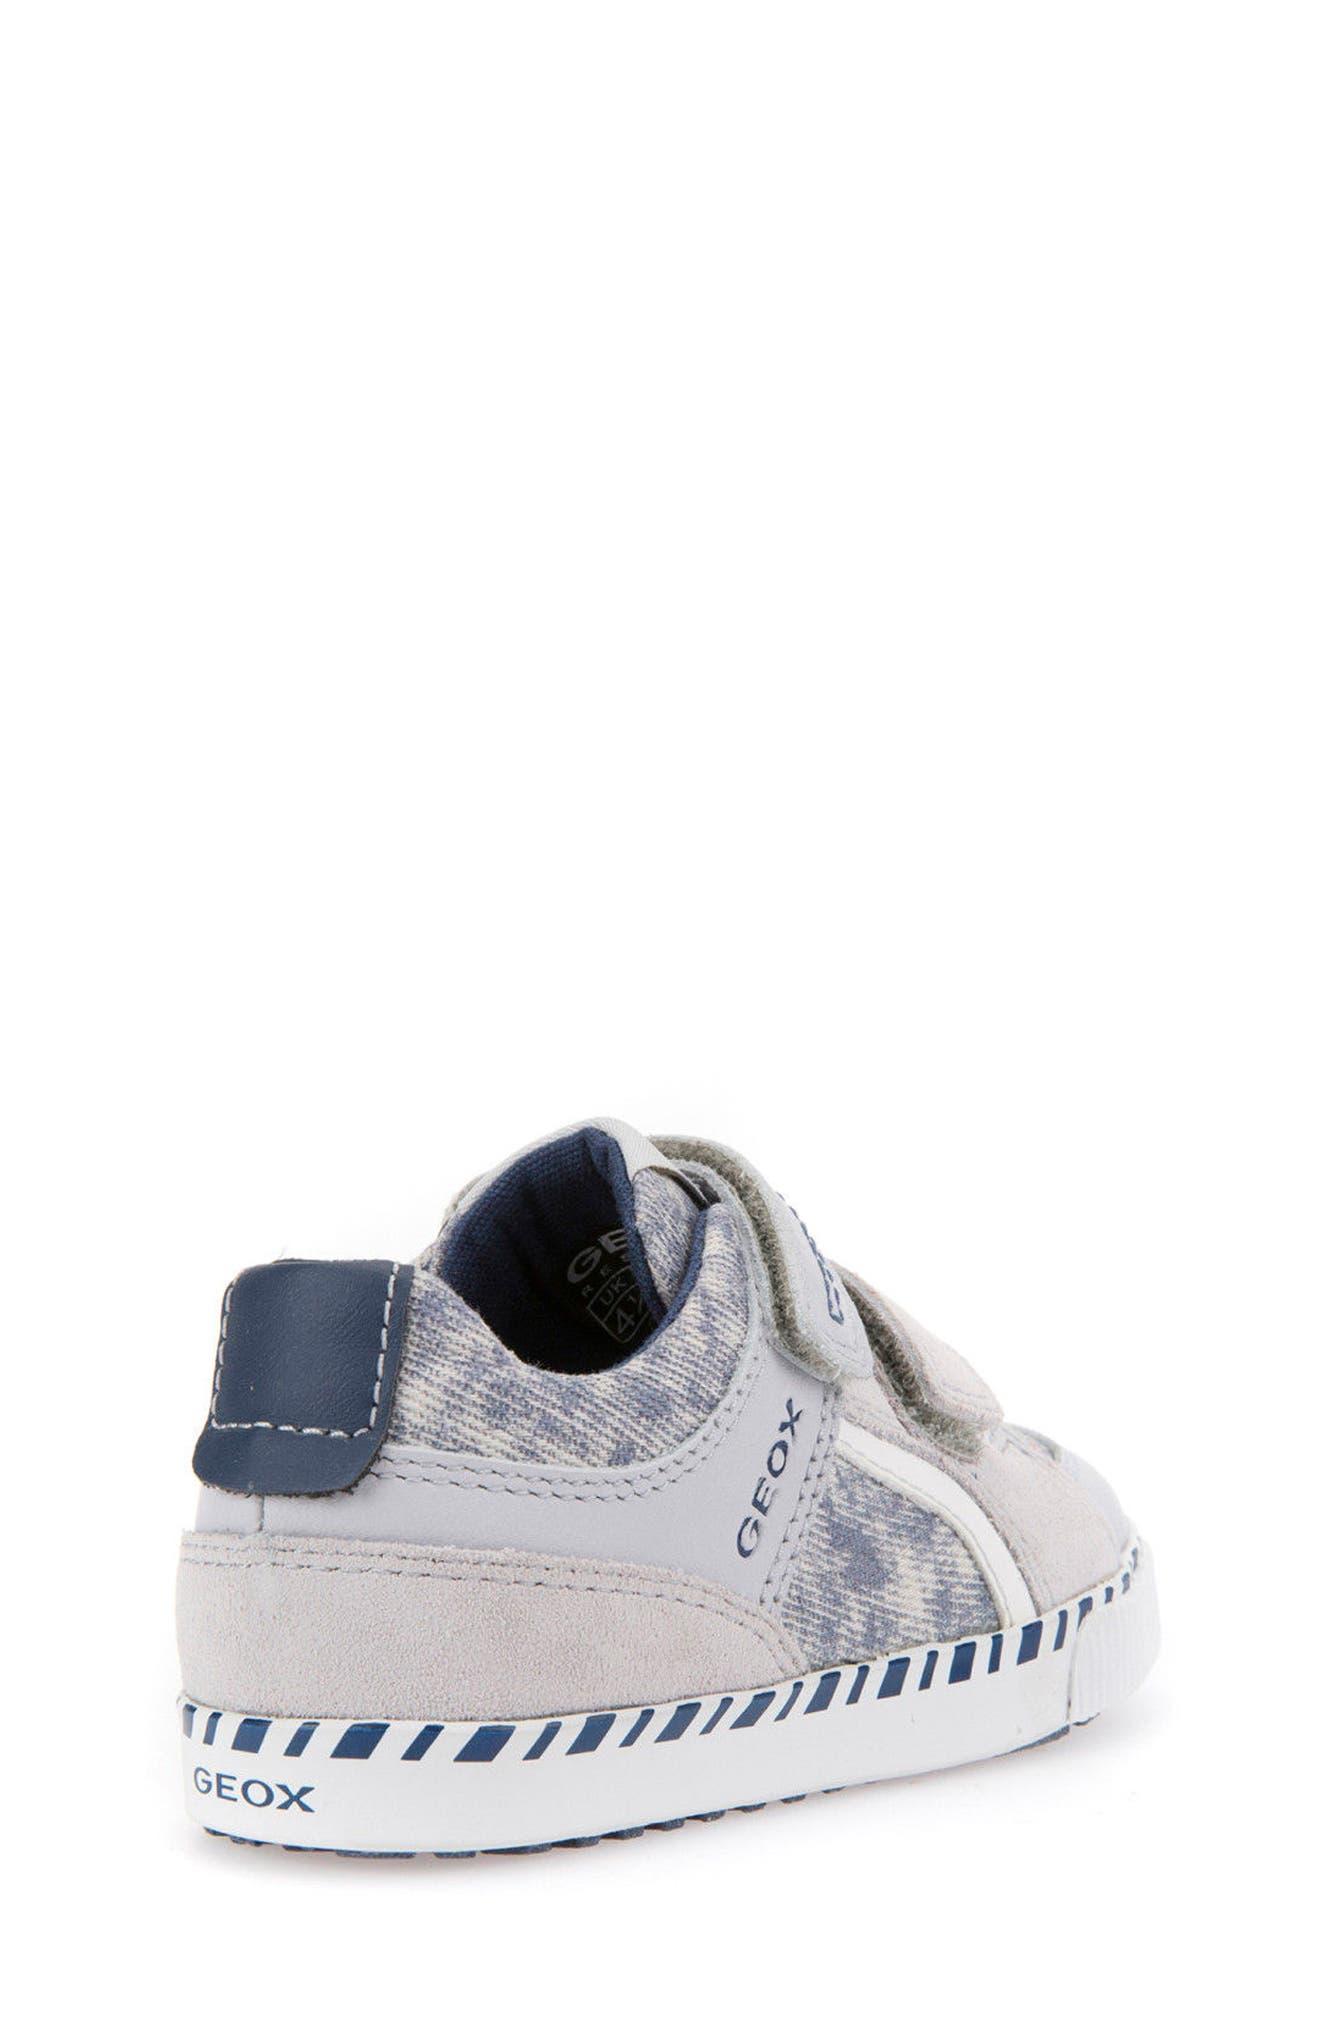 Kilwi Knit Sneaker,                             Alternate thumbnail 2, color,                             LIGHT GREY/ WHITE